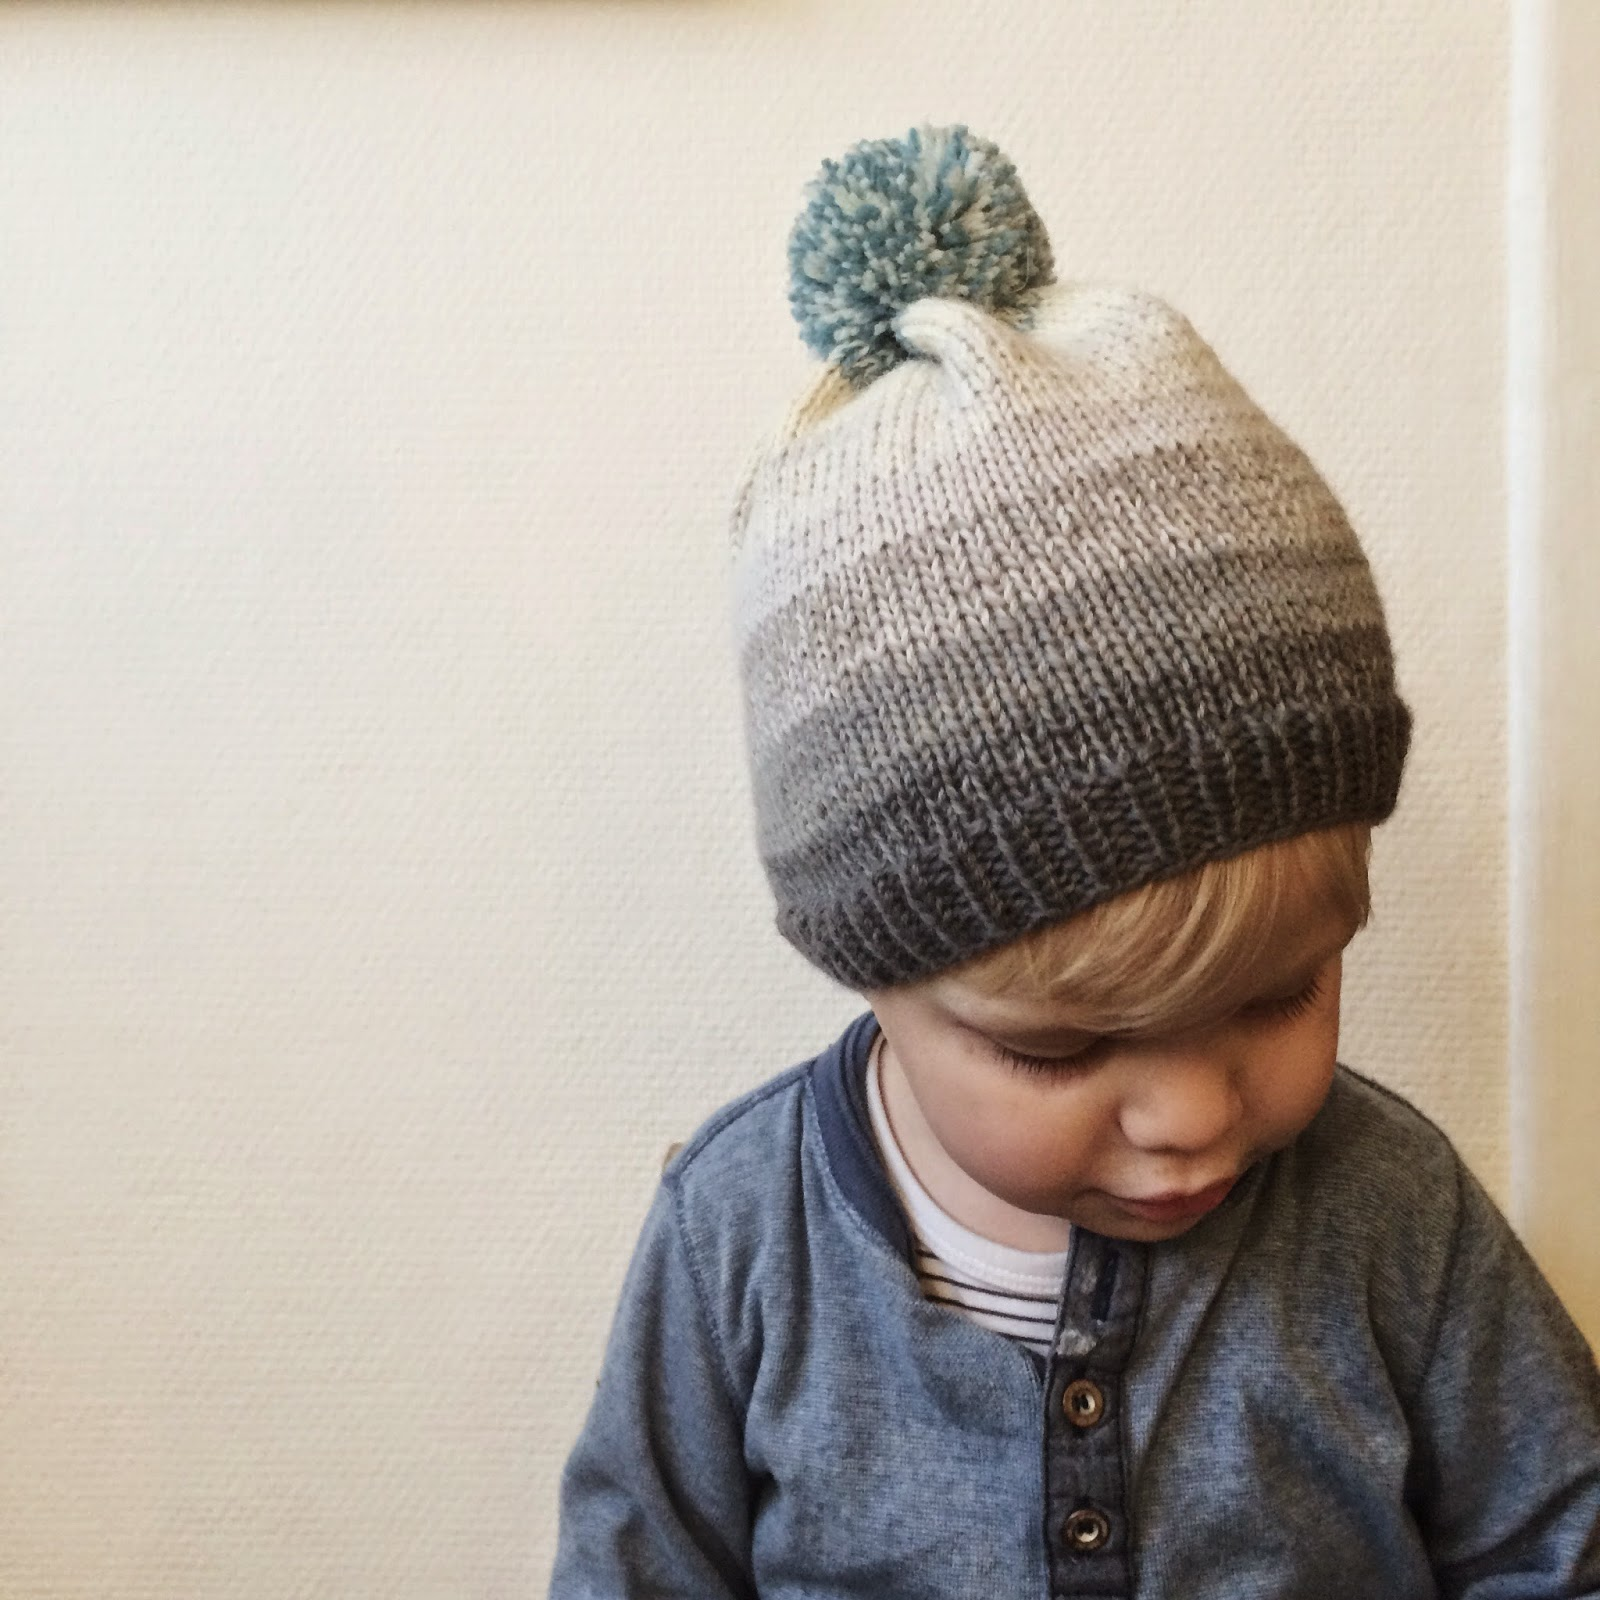 Easy knitting pattern from Meraki; Bobs Beanie